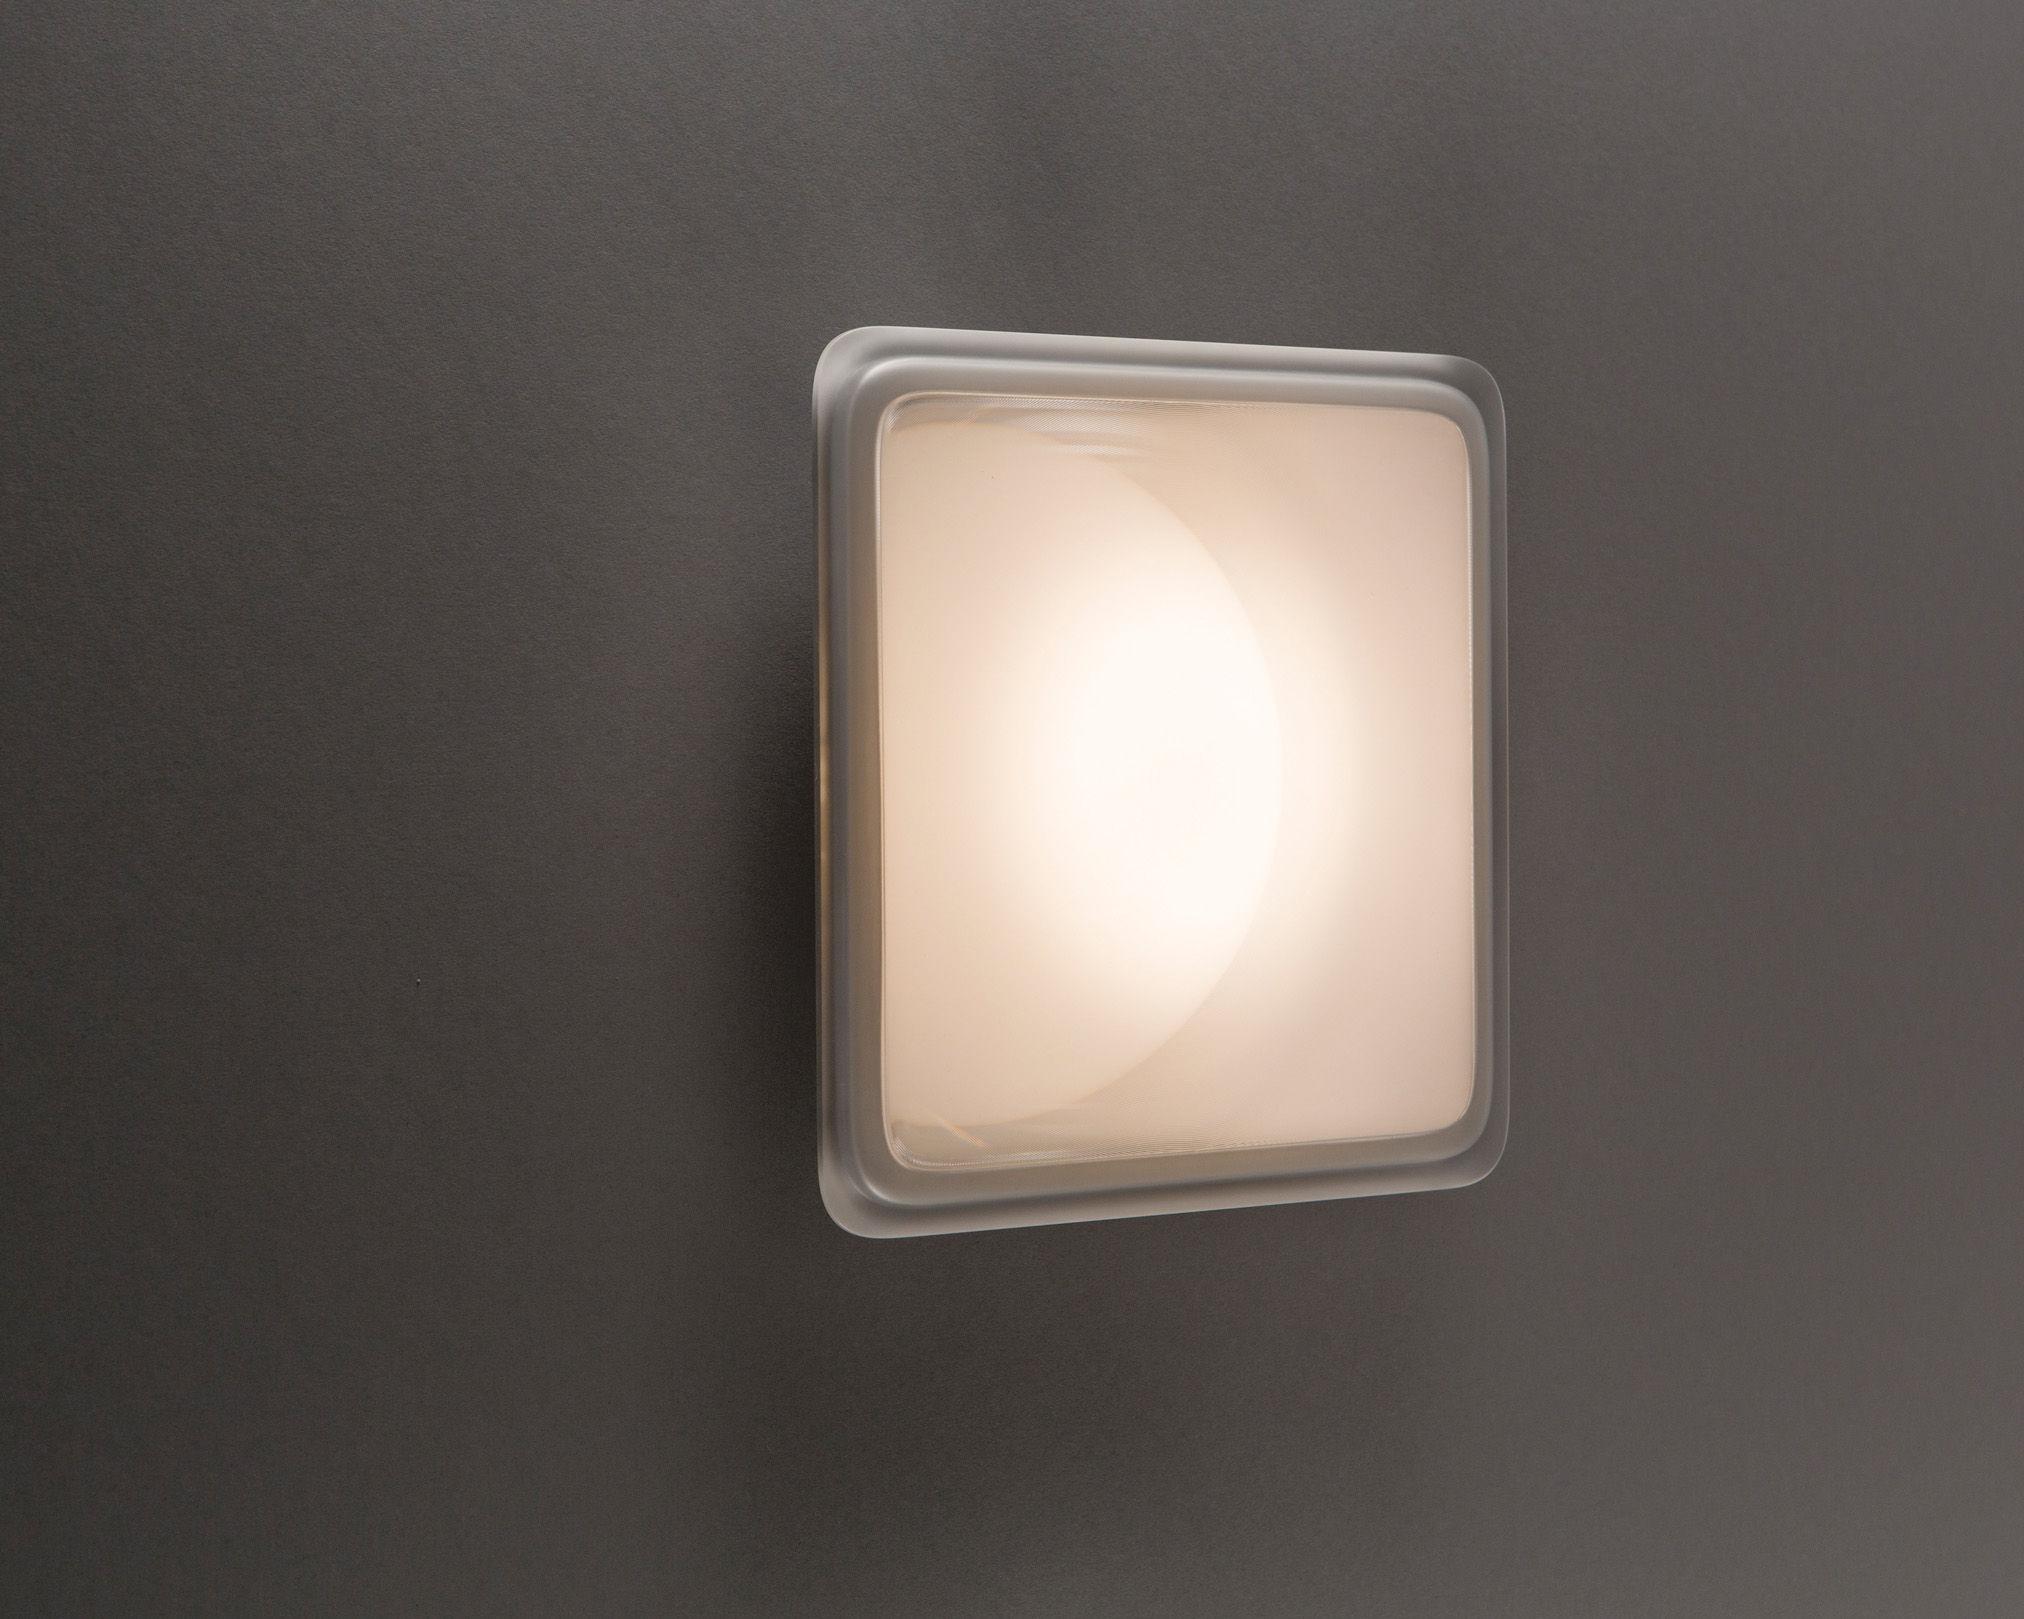 Applique desterno illusion led luceplan trasparente bianco h